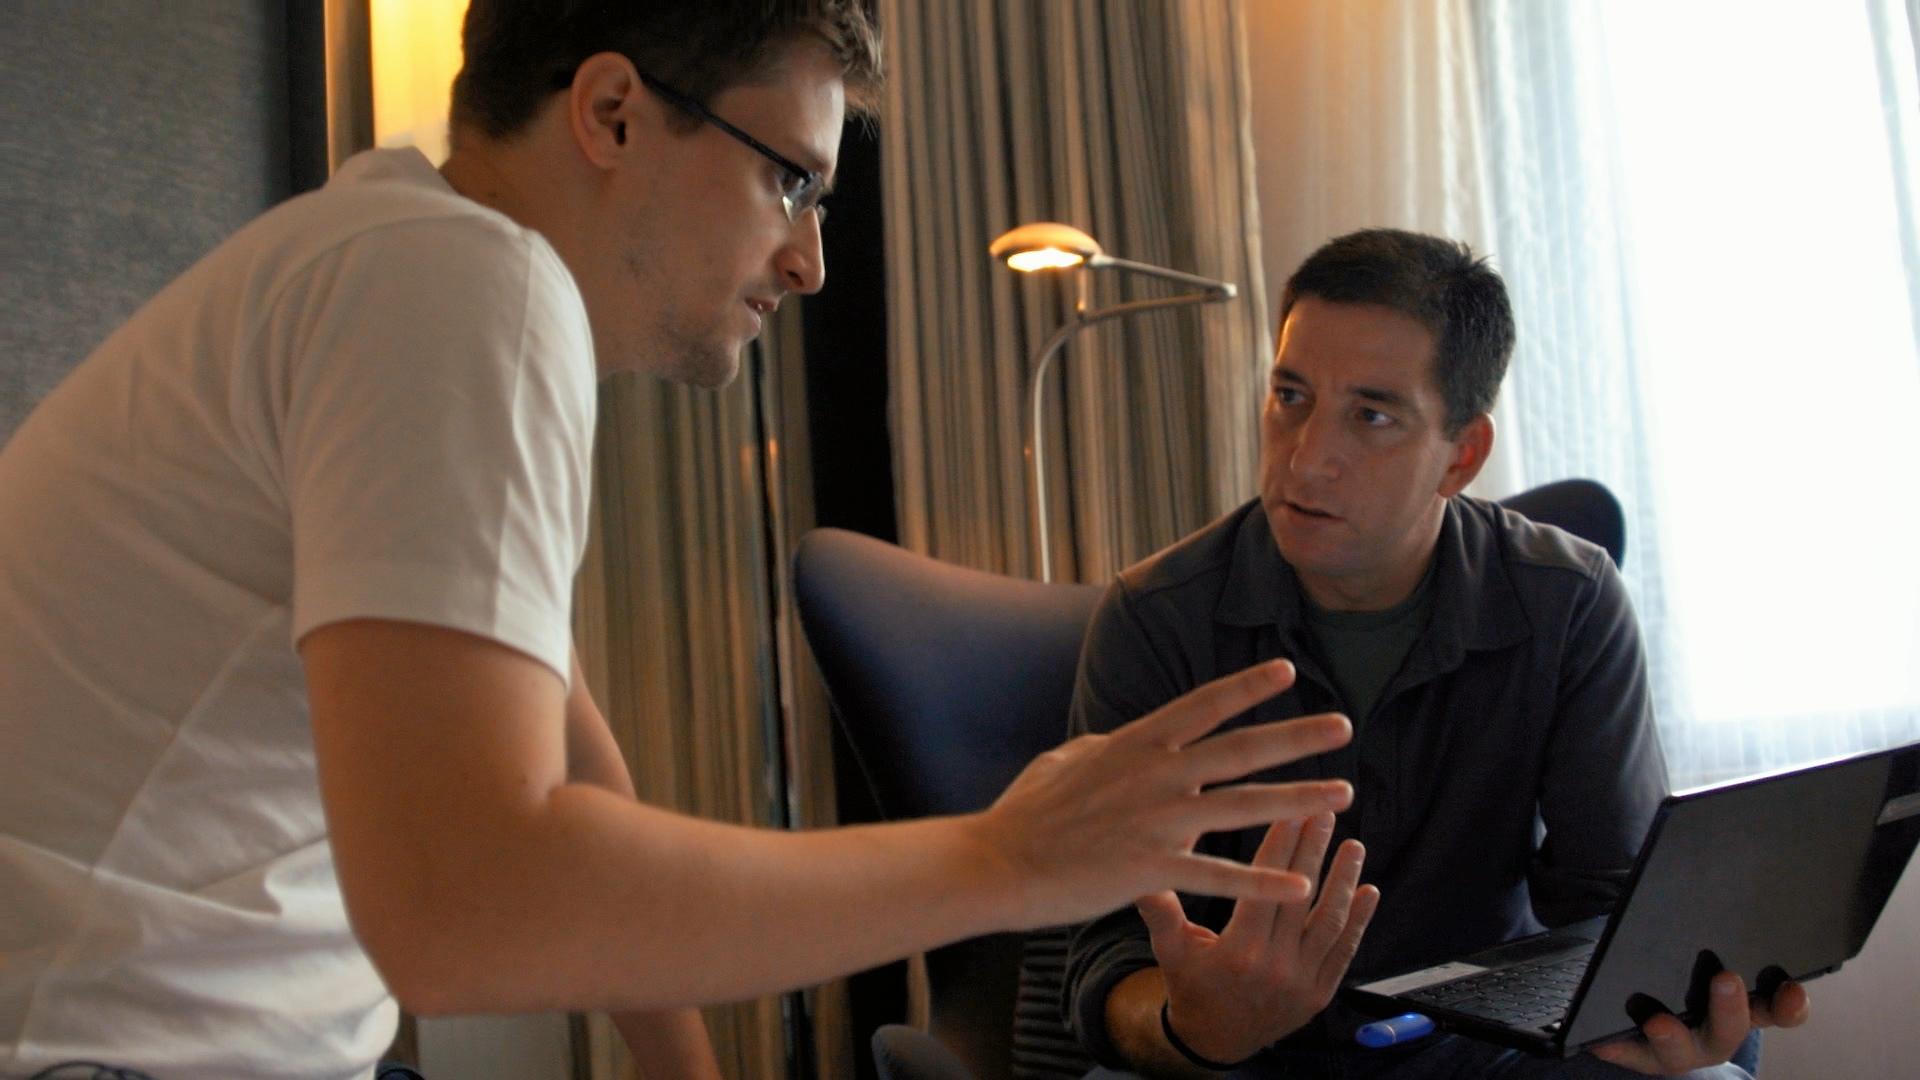 Glenn Greenwald and Edward Snowden in Citizenfour (2014)